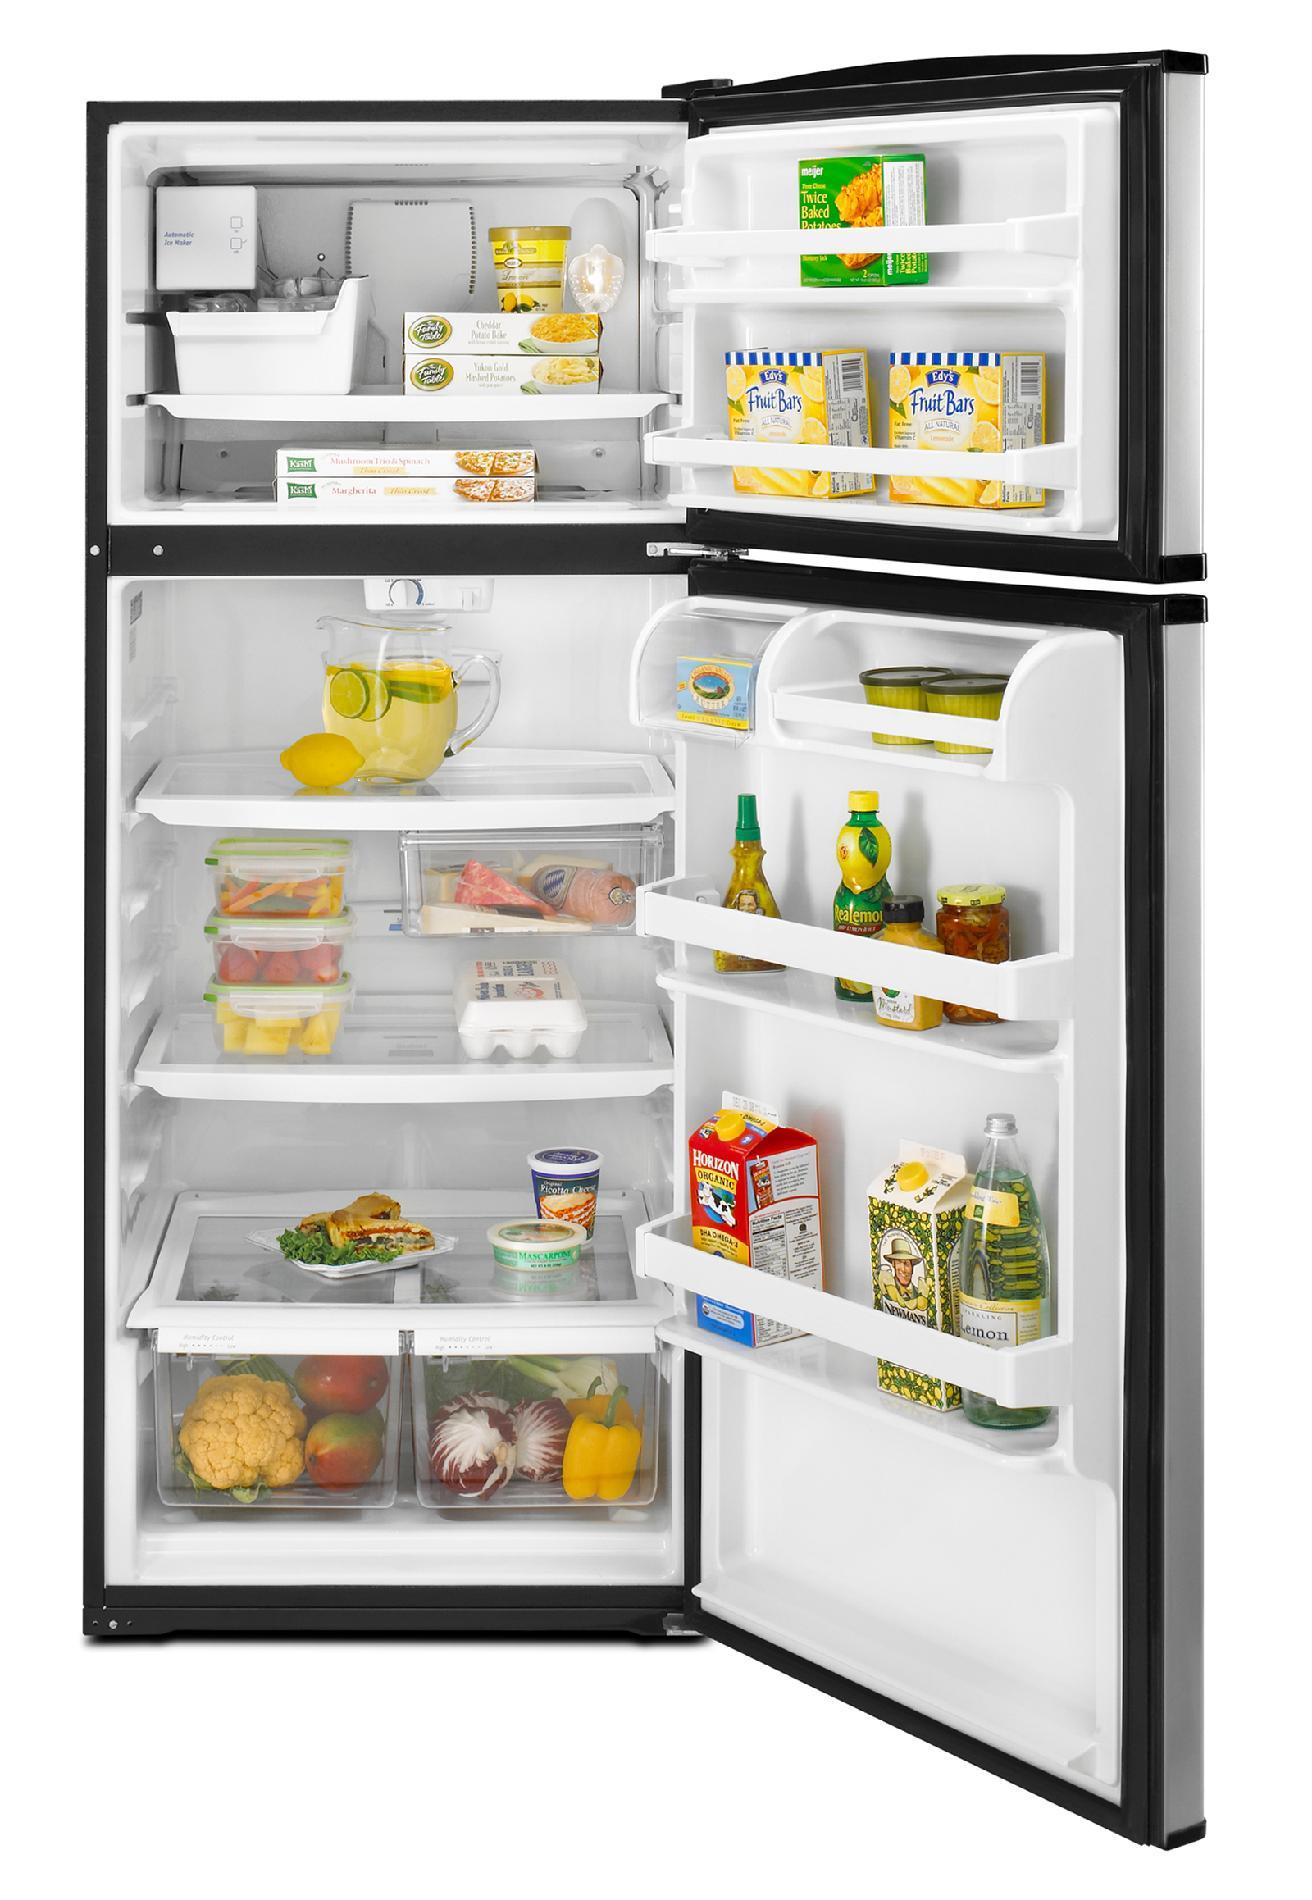 Whirlpool 17.5 cu. ft. Top-Freezer Refrigerator w/ Contour Doors, Ice Maker - Black